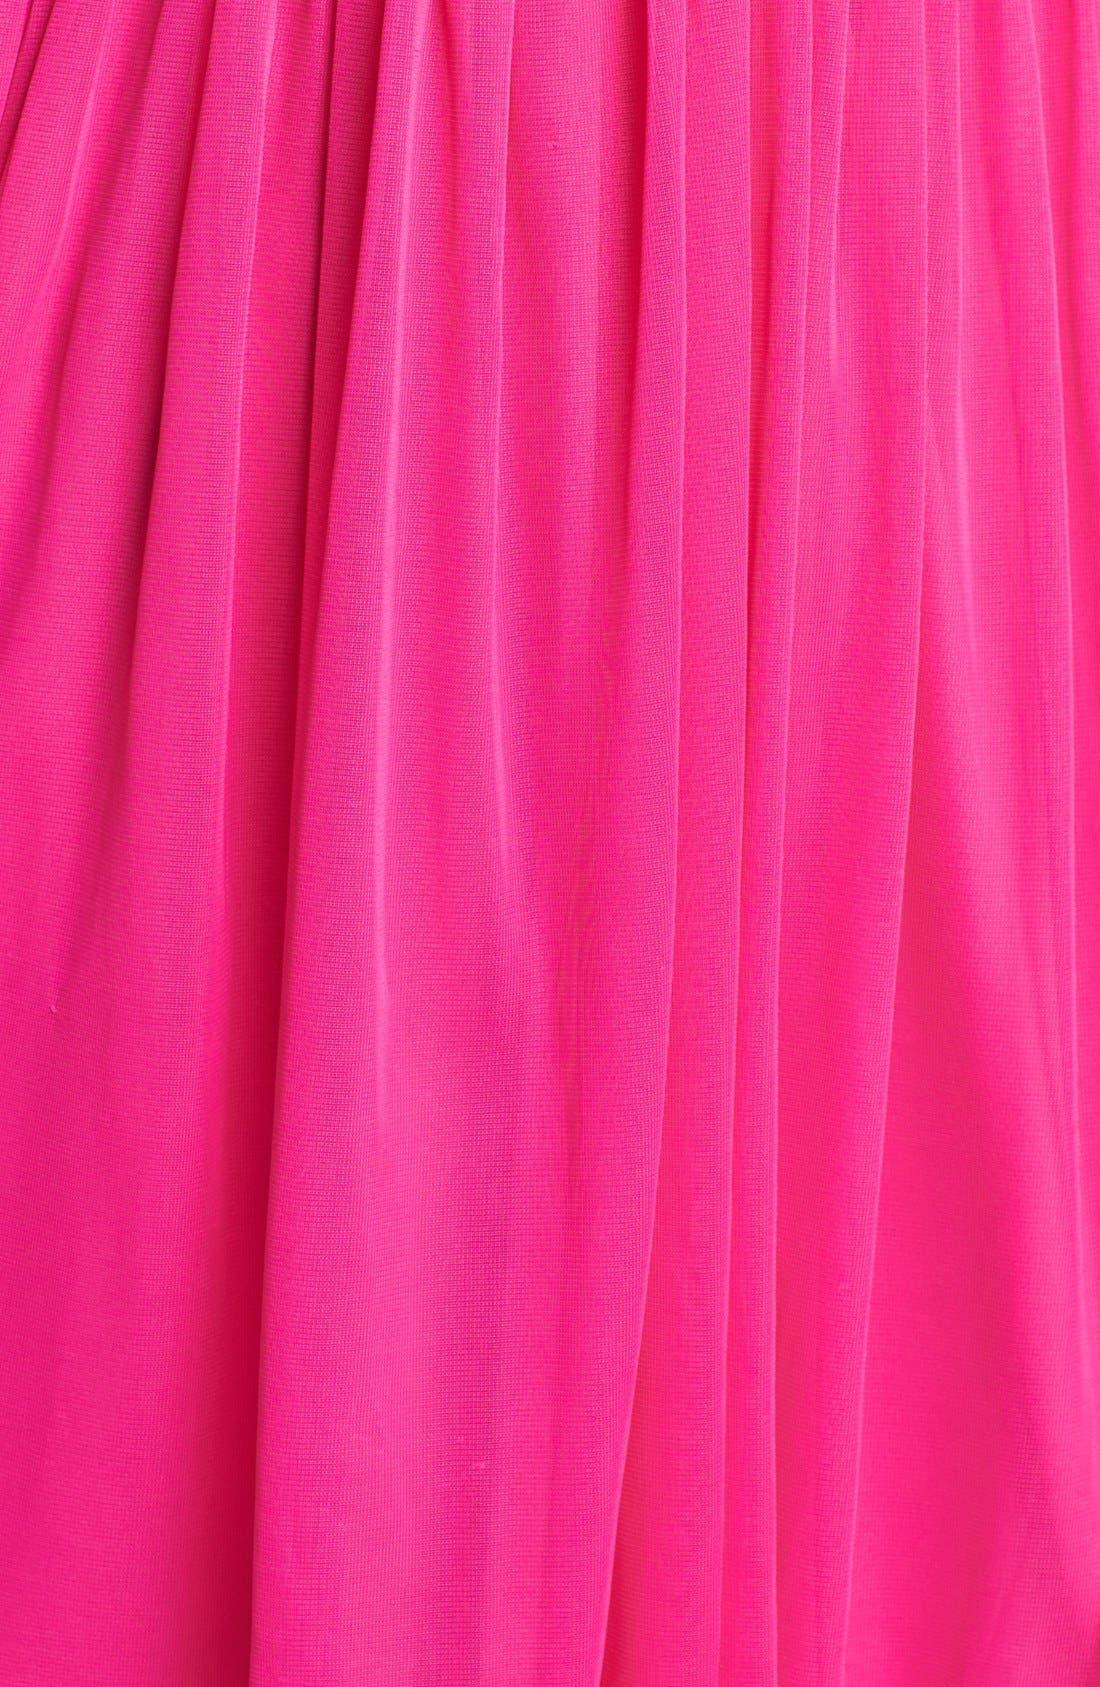 Alternate Image 3  - Way-In Embellished Pleat Bodice Dress (Juniors)